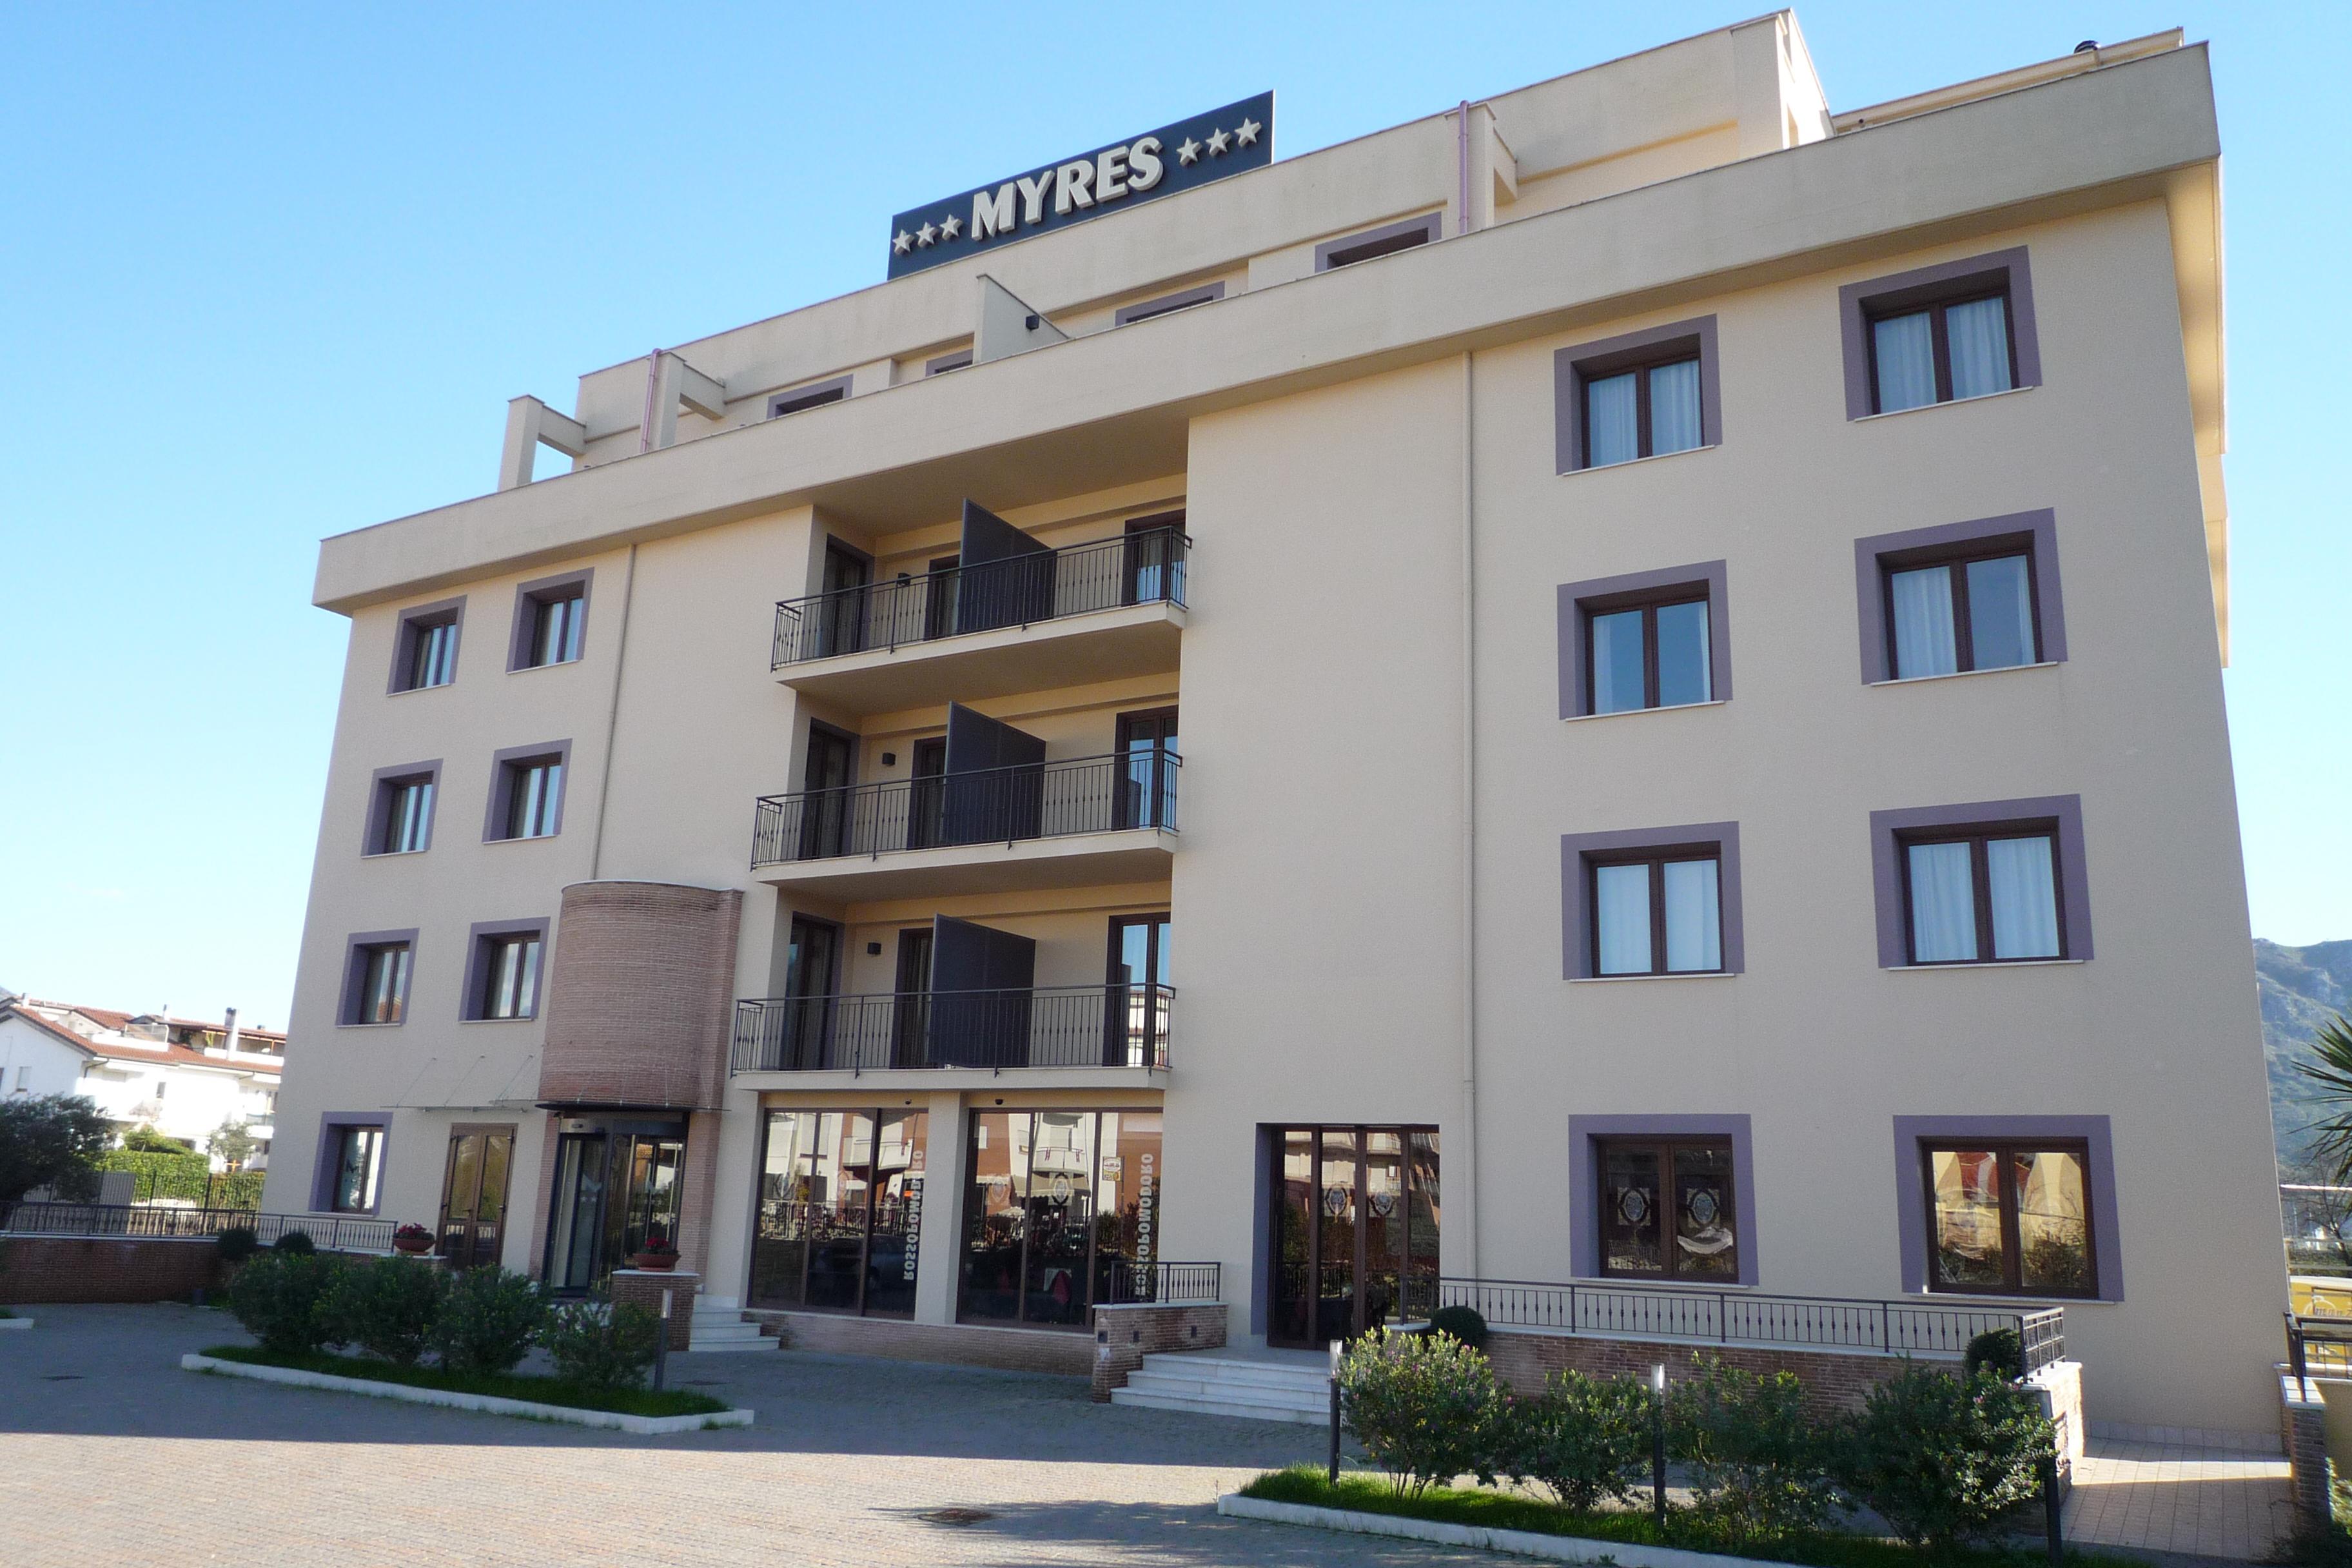 Hotel Myres